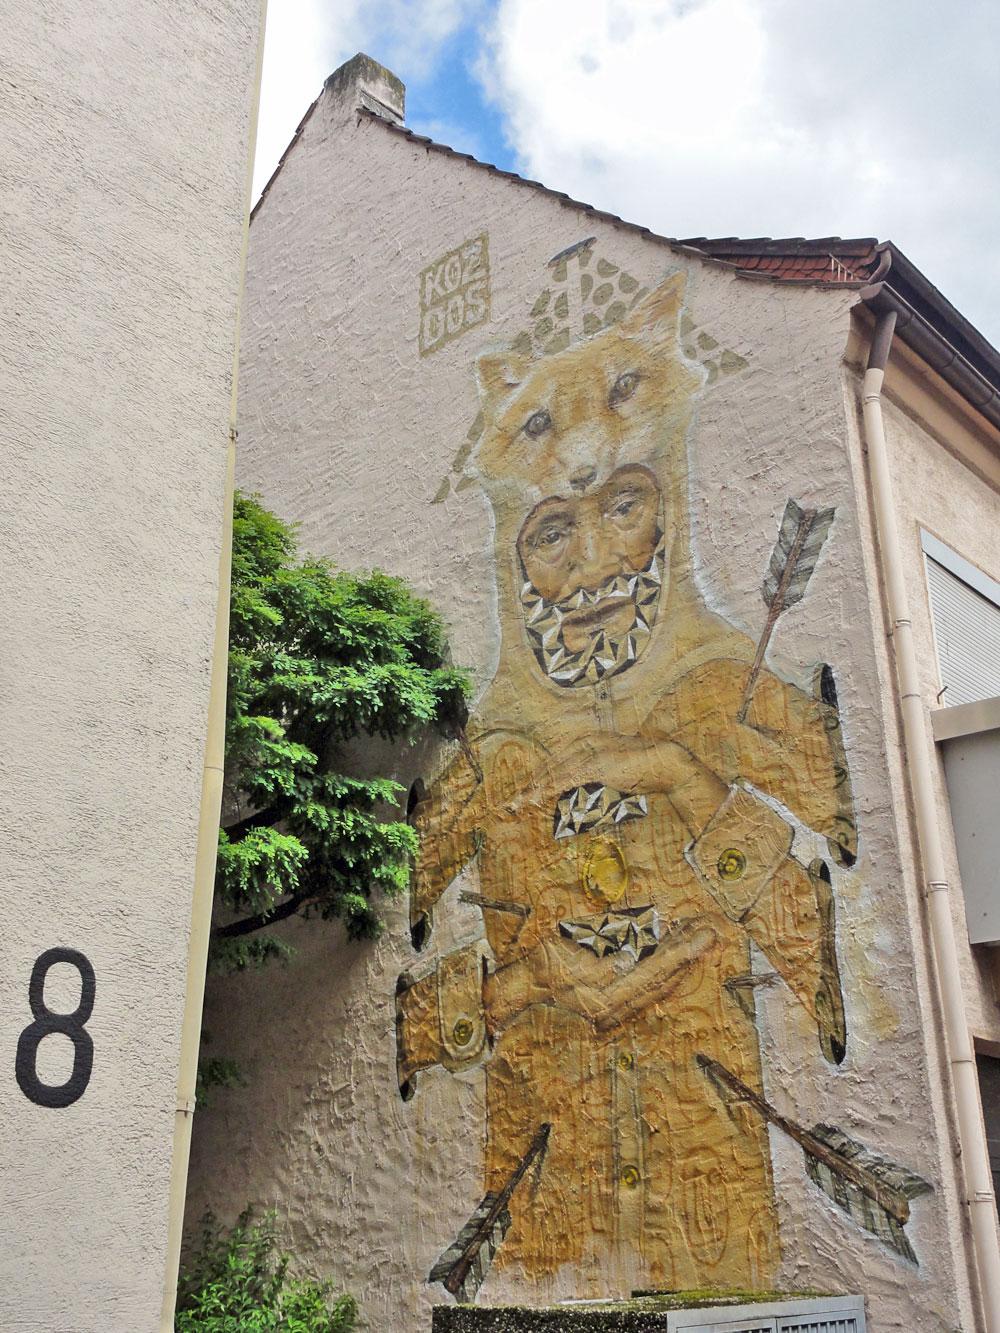 koz-dos-graffiti-hausfassade-mainz-kastel